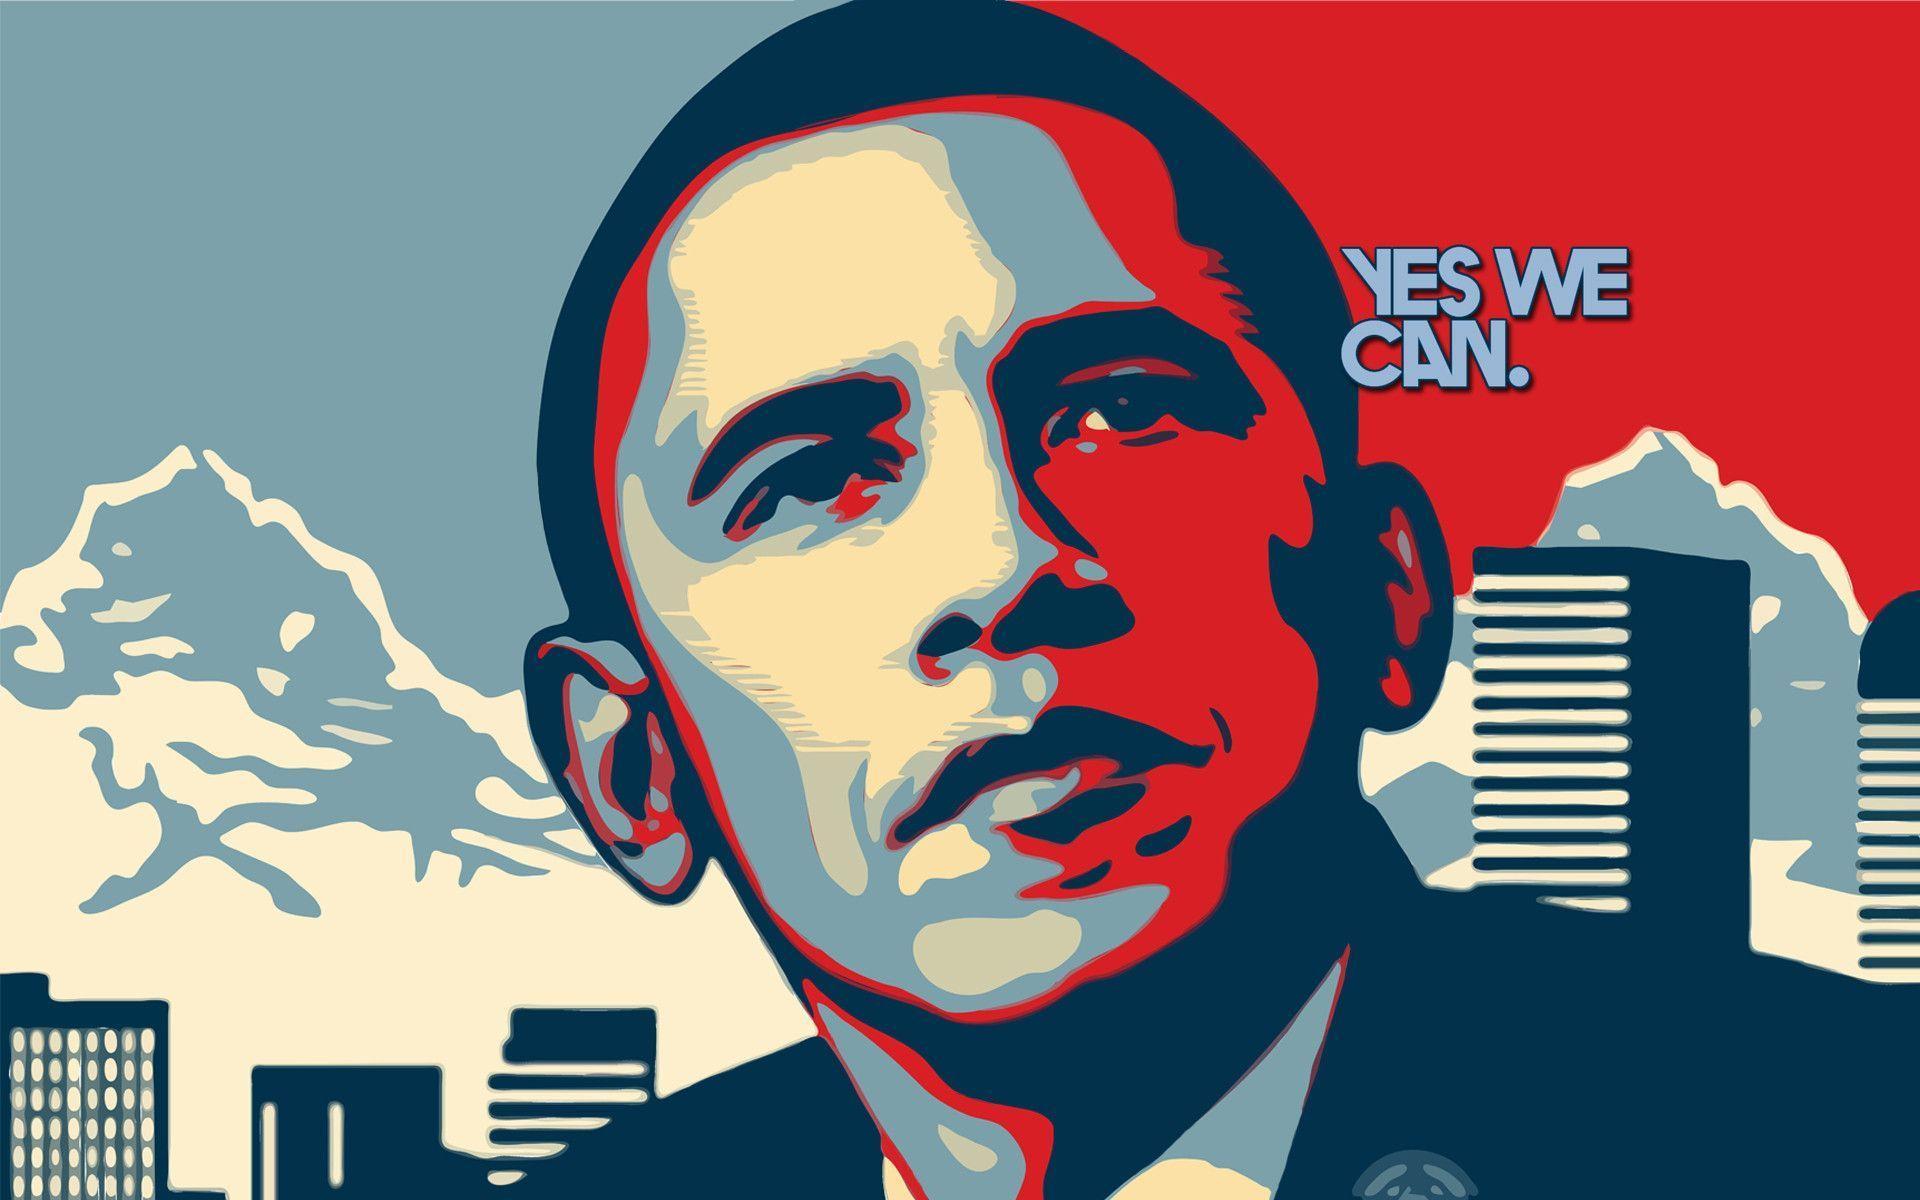 Fonds D'écran Barack Obama - Obama Yes We Can , HD Wallpaper & Backgrounds